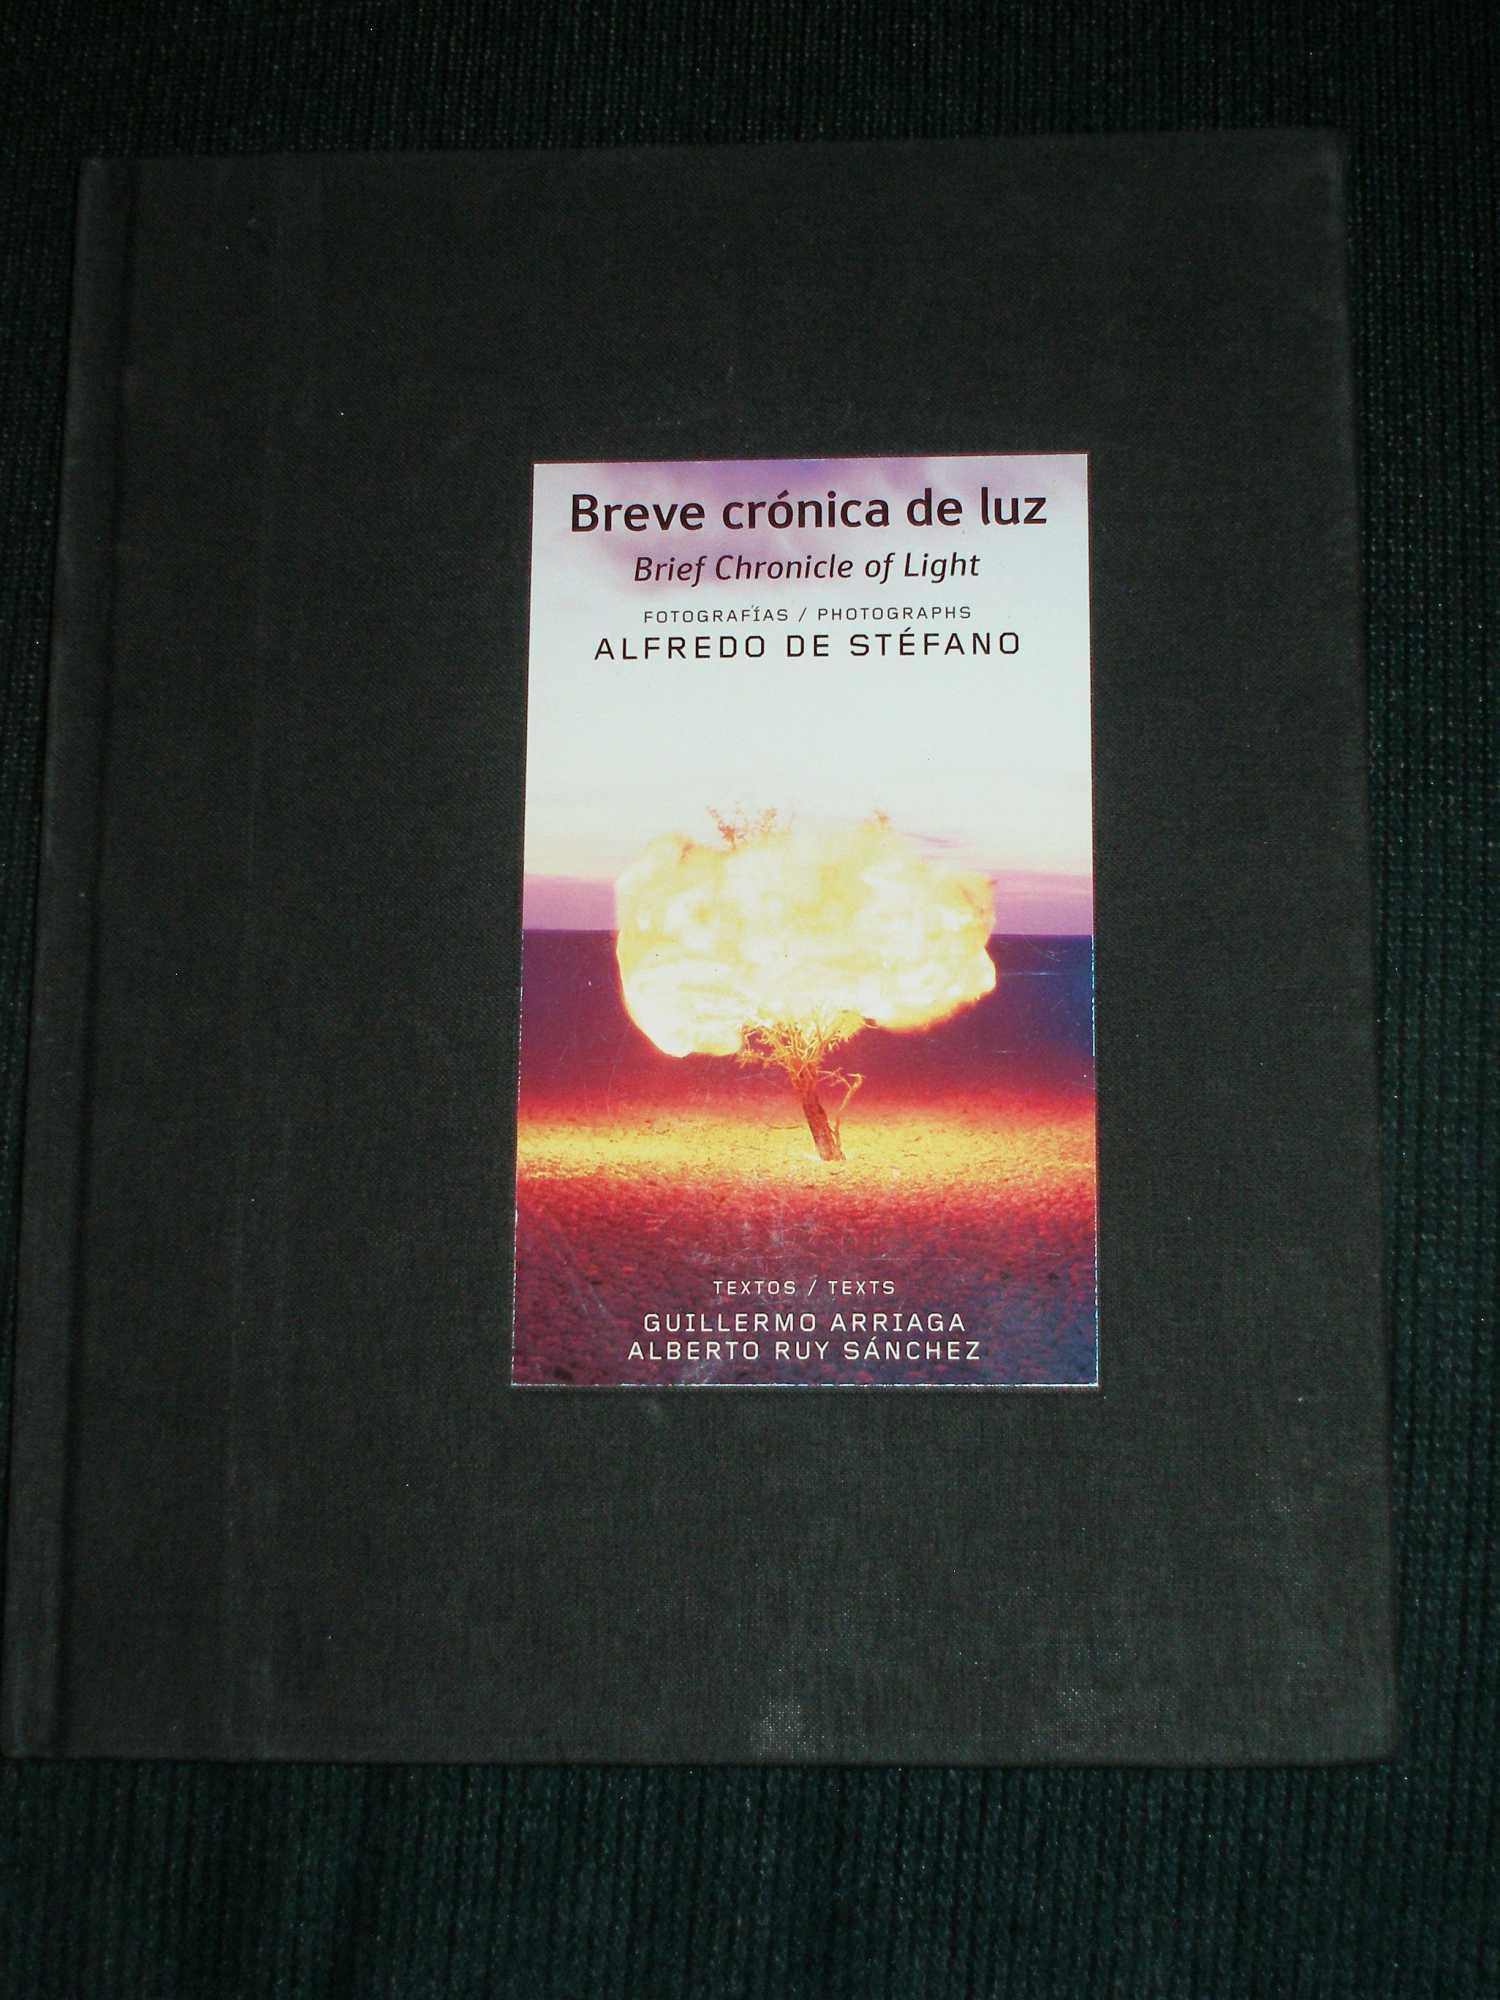 Breve Cronica de Luz (Brief Chronicle of Light), Arriaga, Guillermo ; Ruy-Sanchez, Alberto